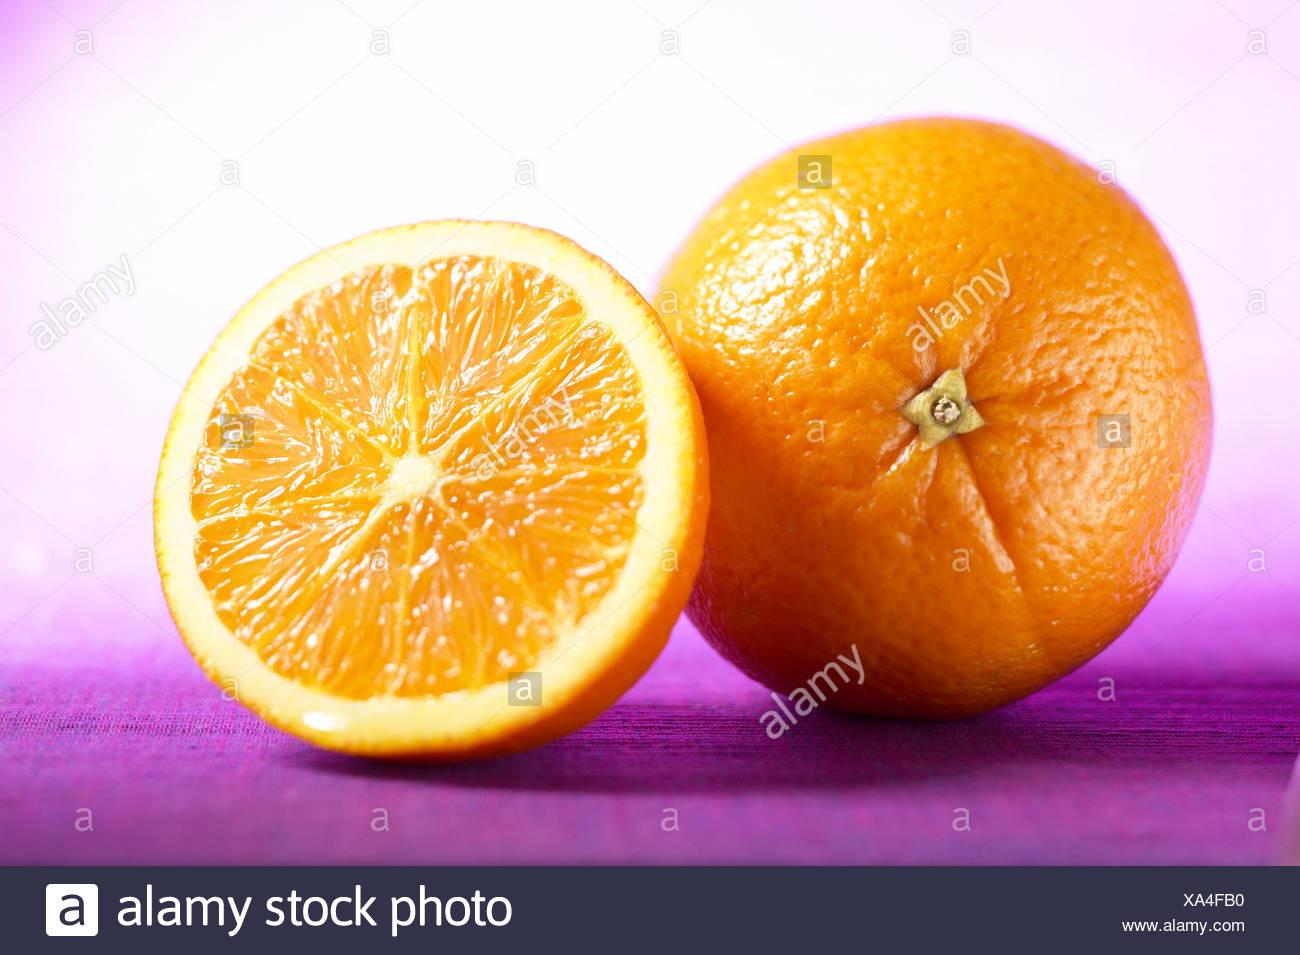 Whole and half and orange - Stock Image